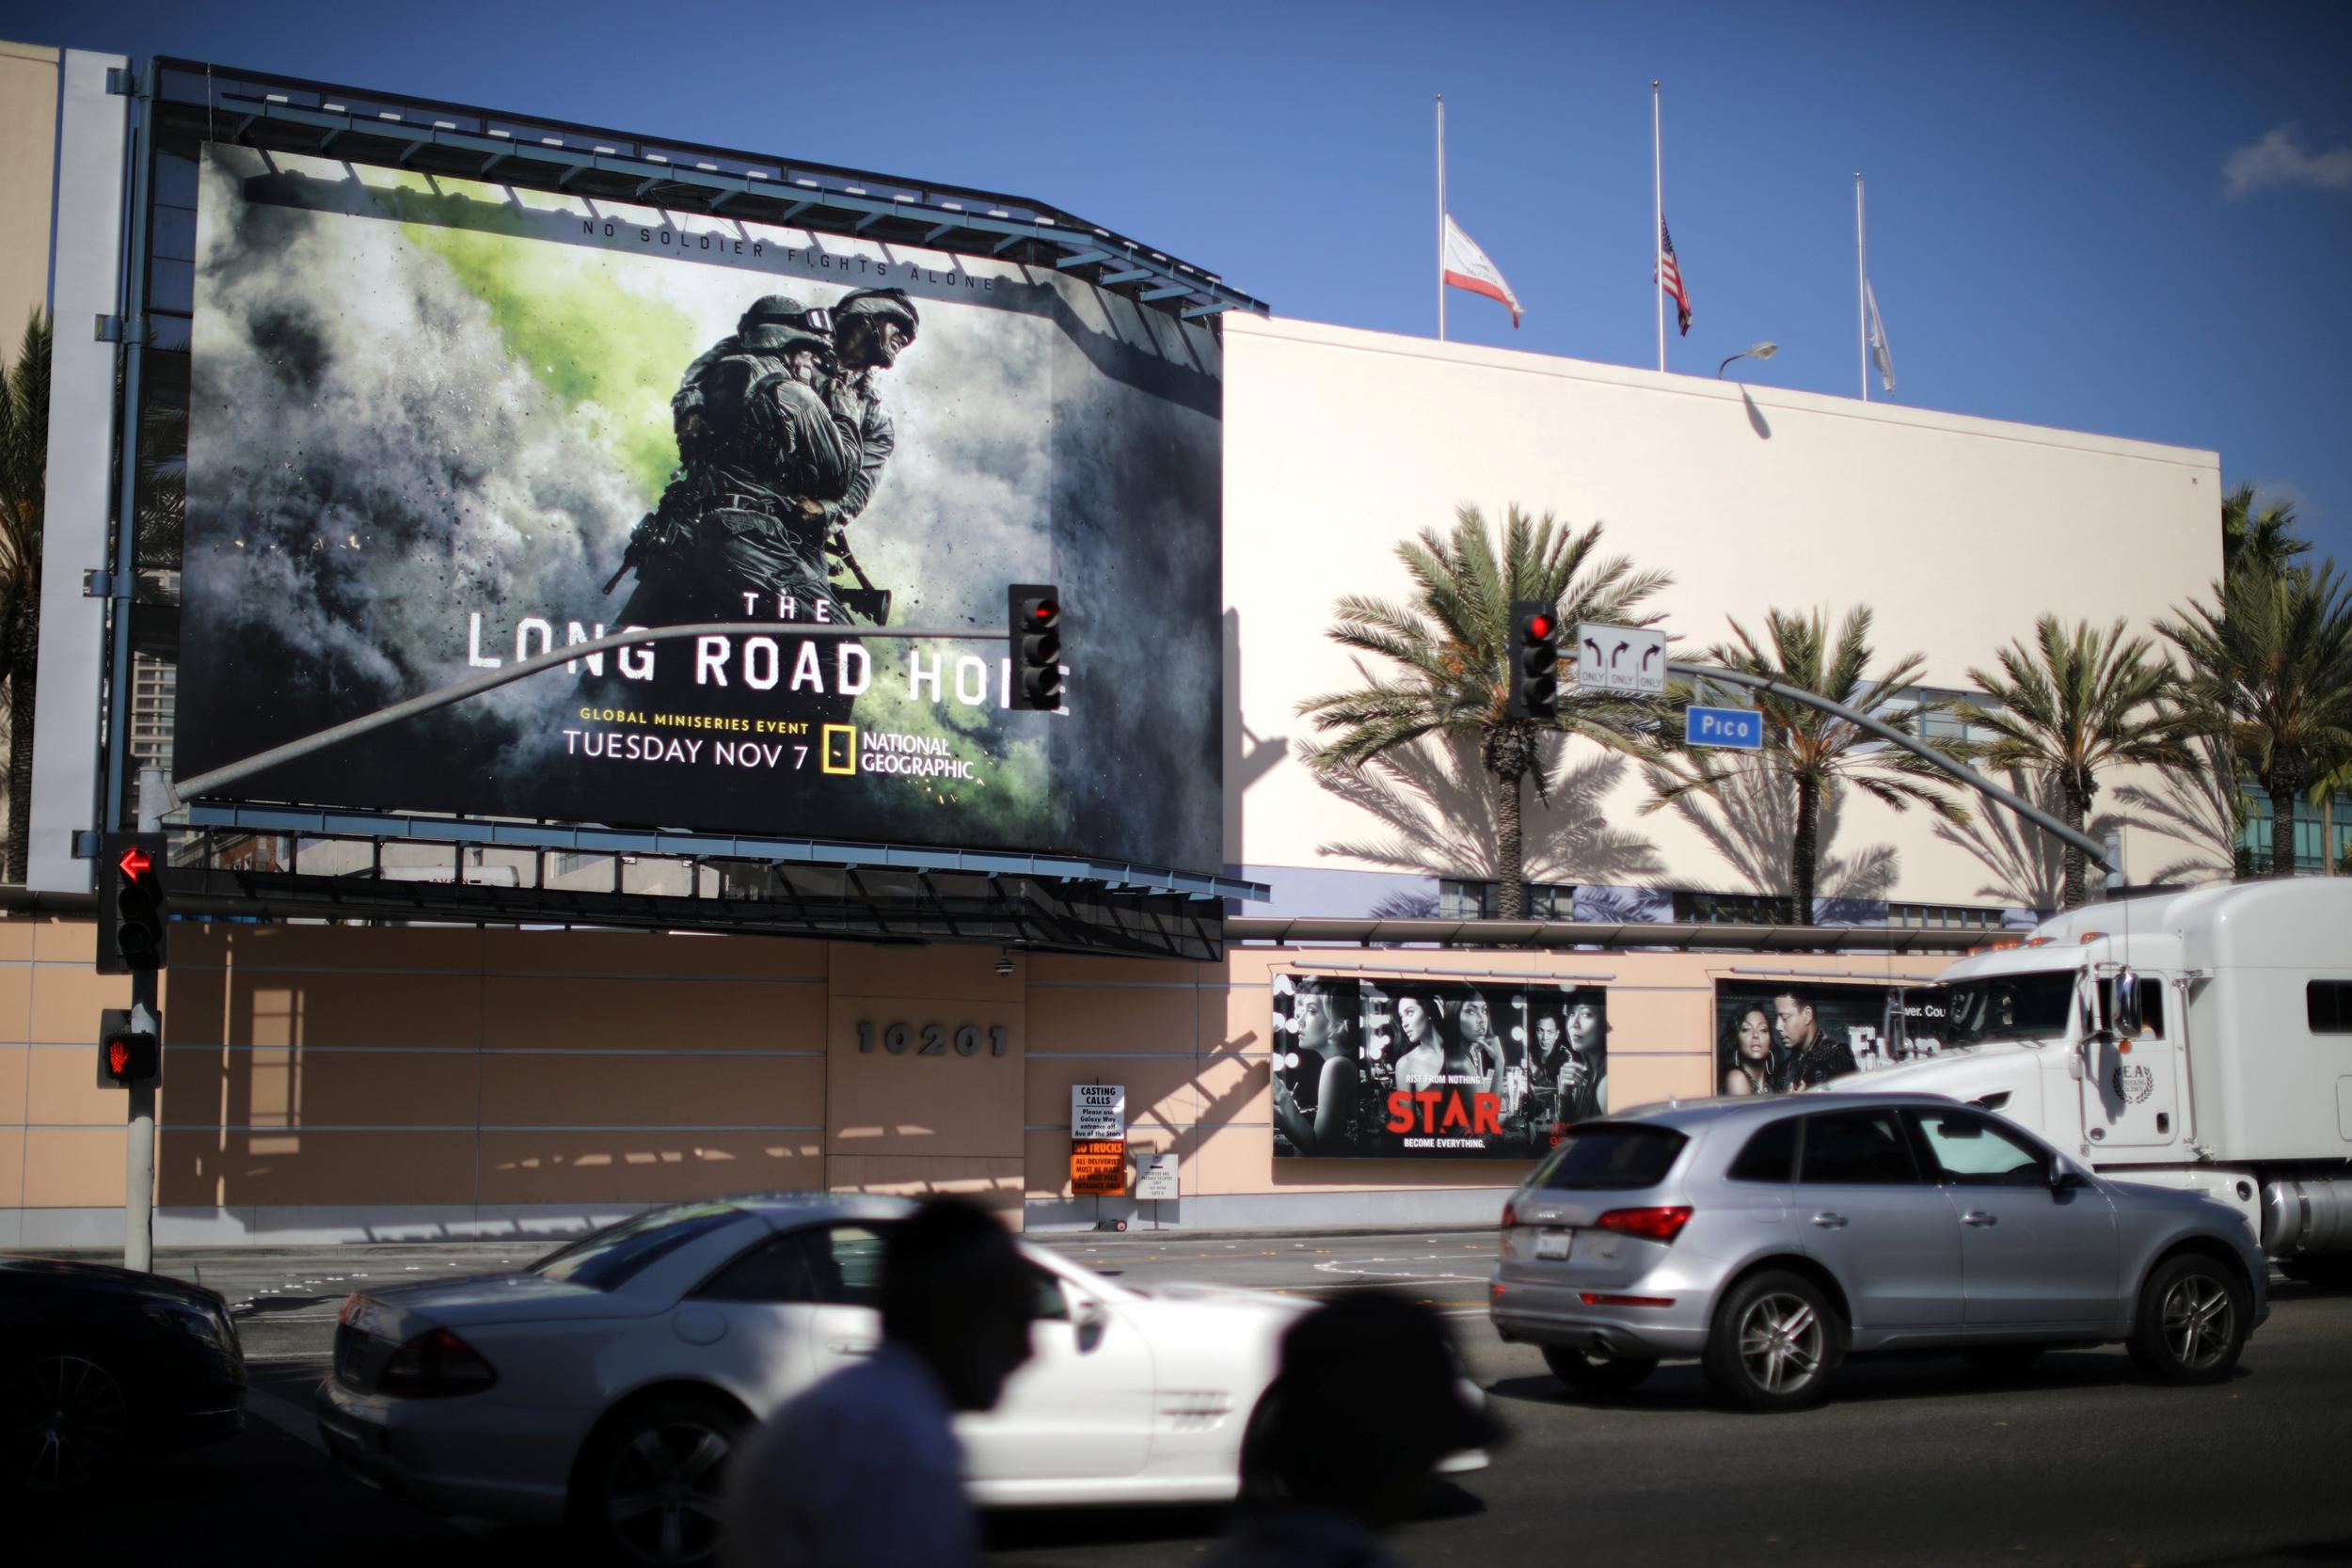 Image: The 21st Century Fox Studios building in Los Angeles